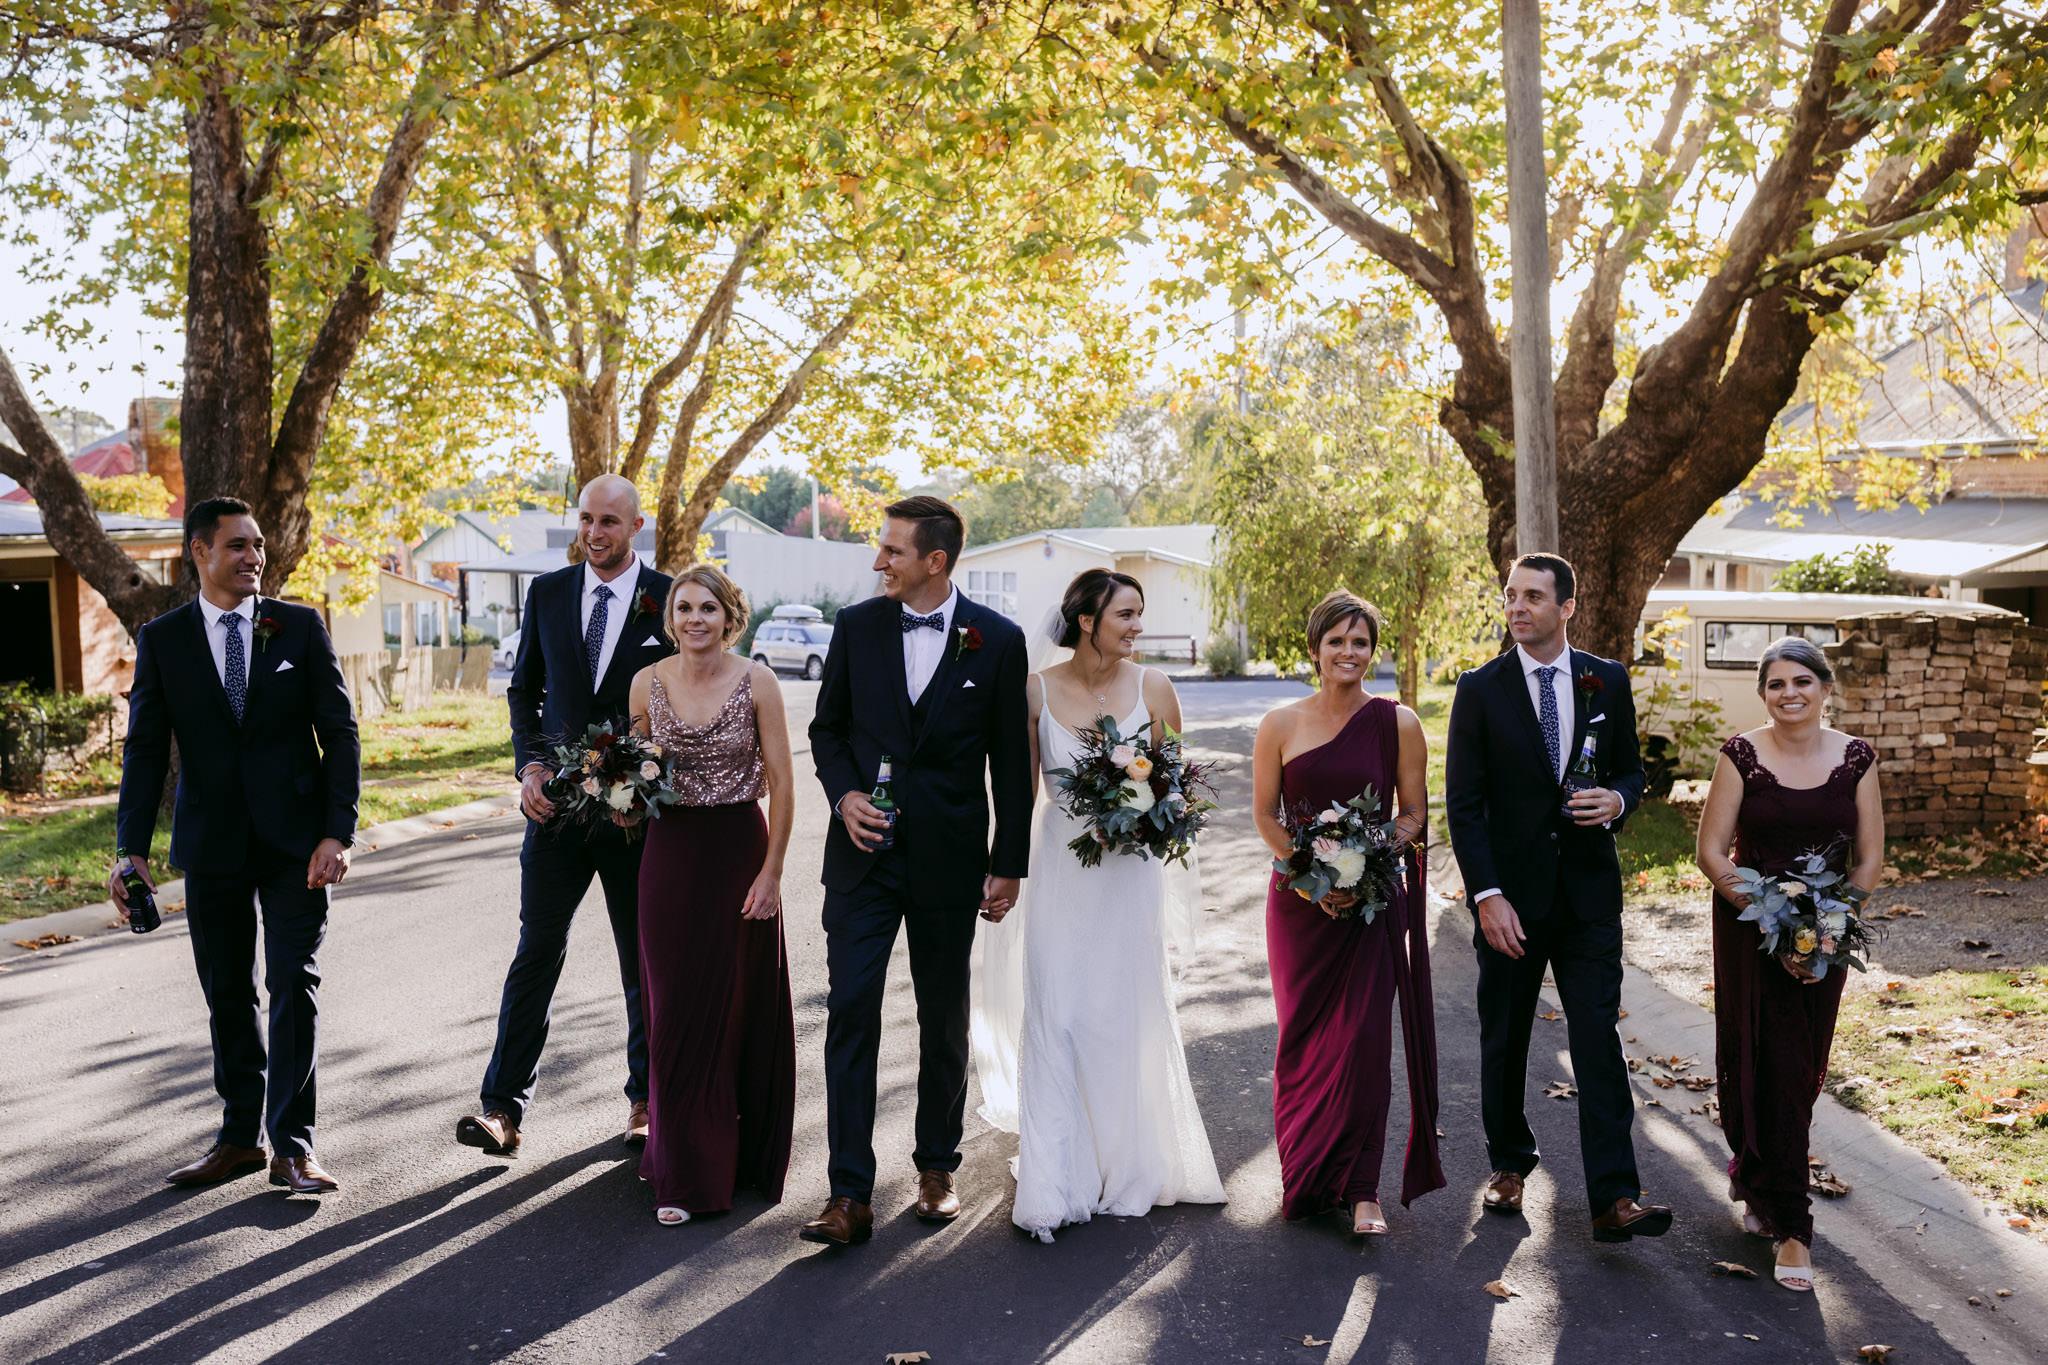 Erin Latimore Mudgee Canberra Wedding Photographer ROSEBANK GUESTHOUSE OLD THEATRE TONIC MILLTHORPE_561.JPG